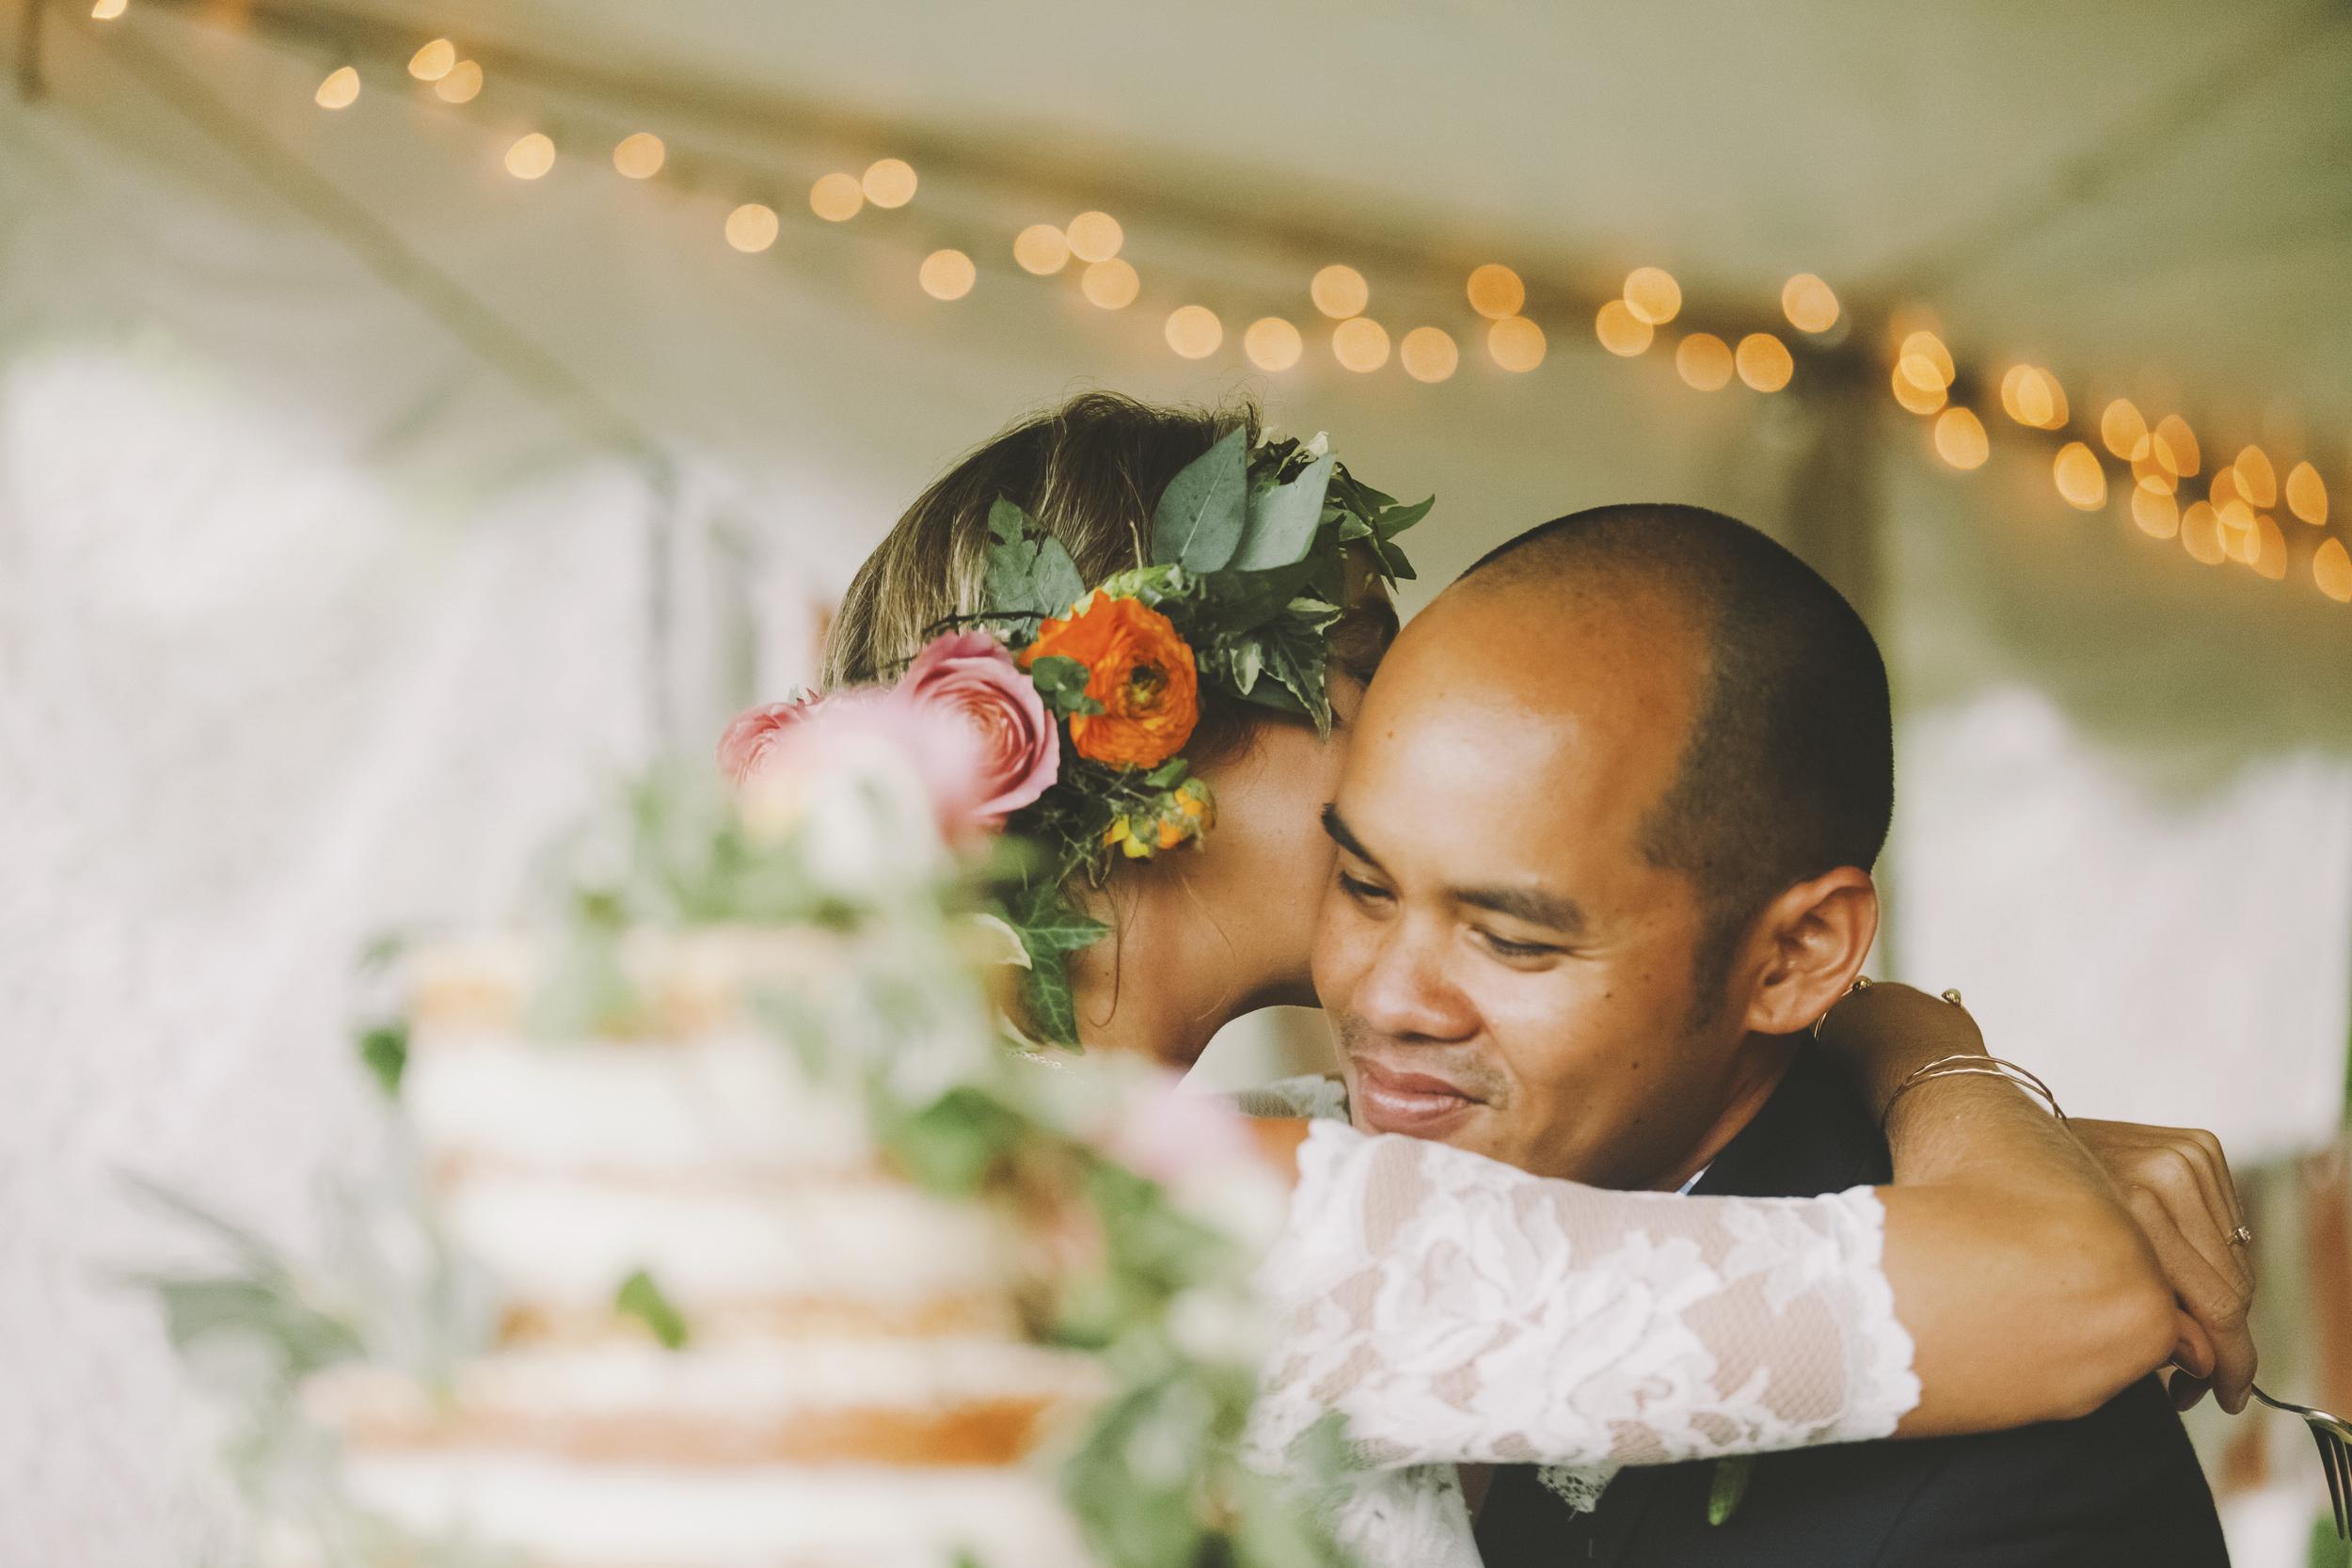 angie-diaz-photography-oahu-hawaii-wedding-tradewinds-ranch-110.jpg